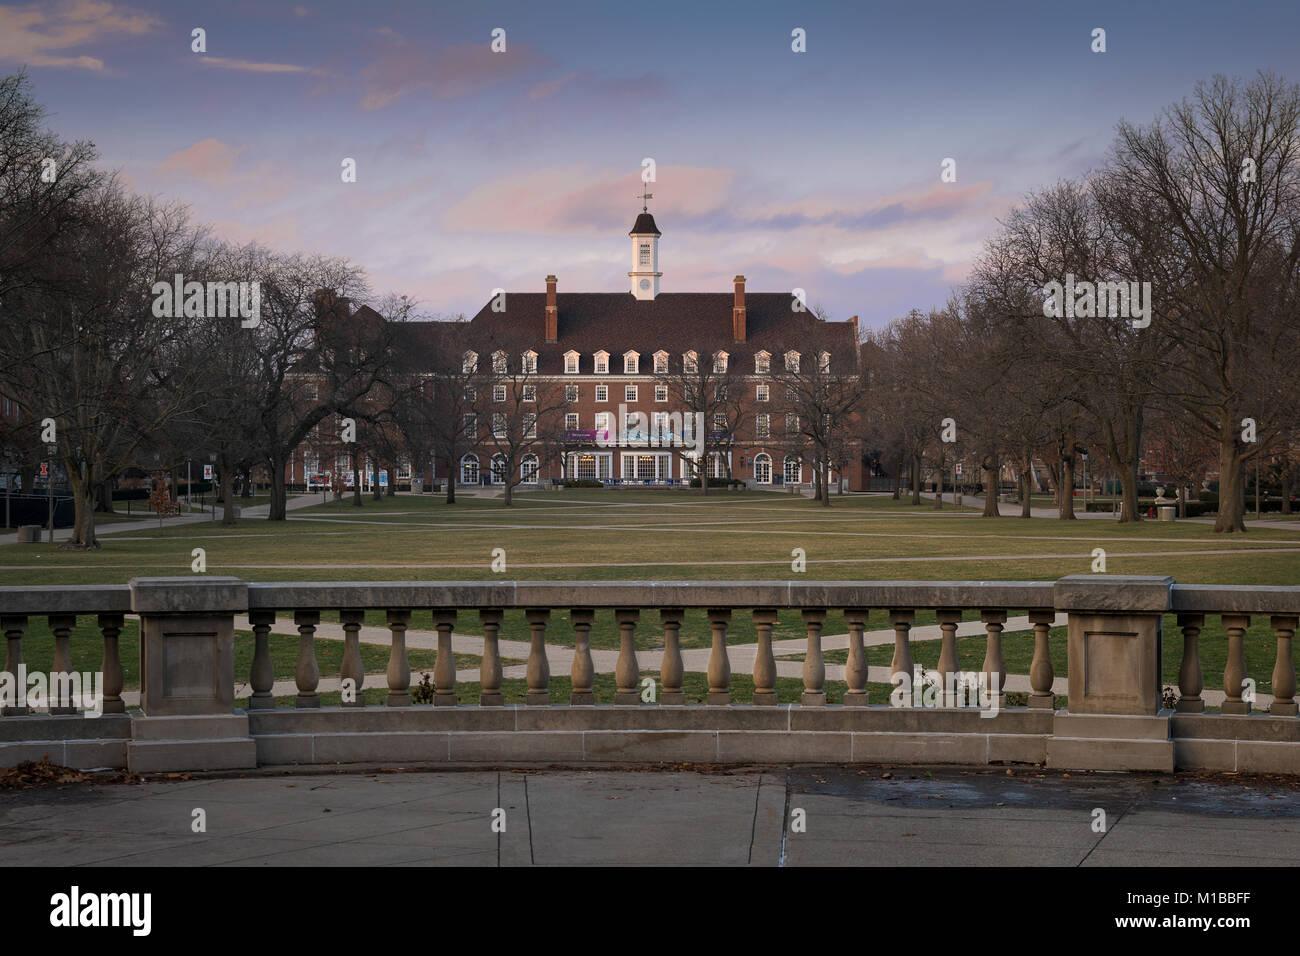 Illini Union and the main Quad on the campus of the University of Illinois at Urbana-Champaign in Urbana, Illinois - Stock Image